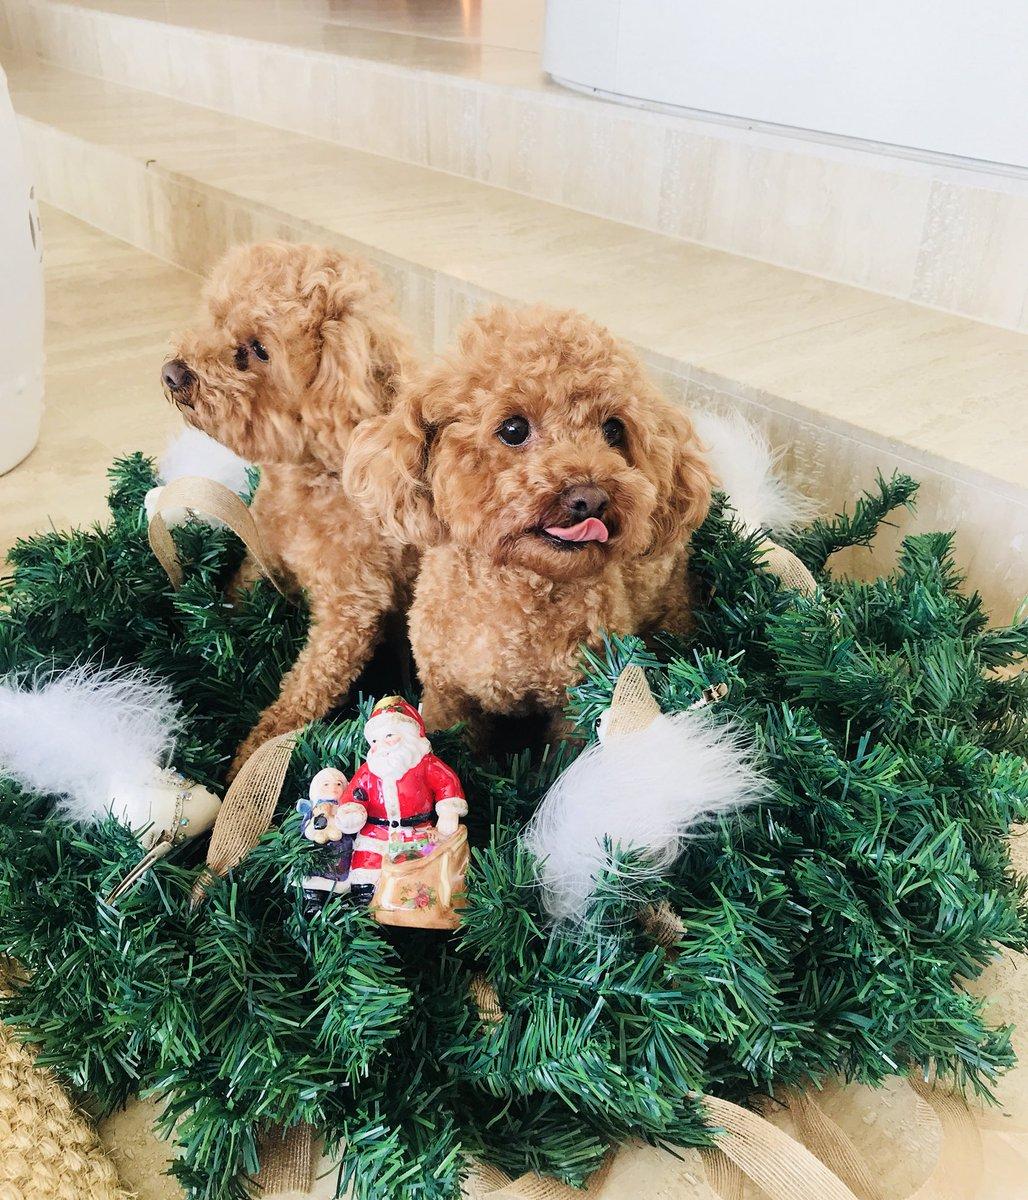 My puppies can already taste #Christmas...